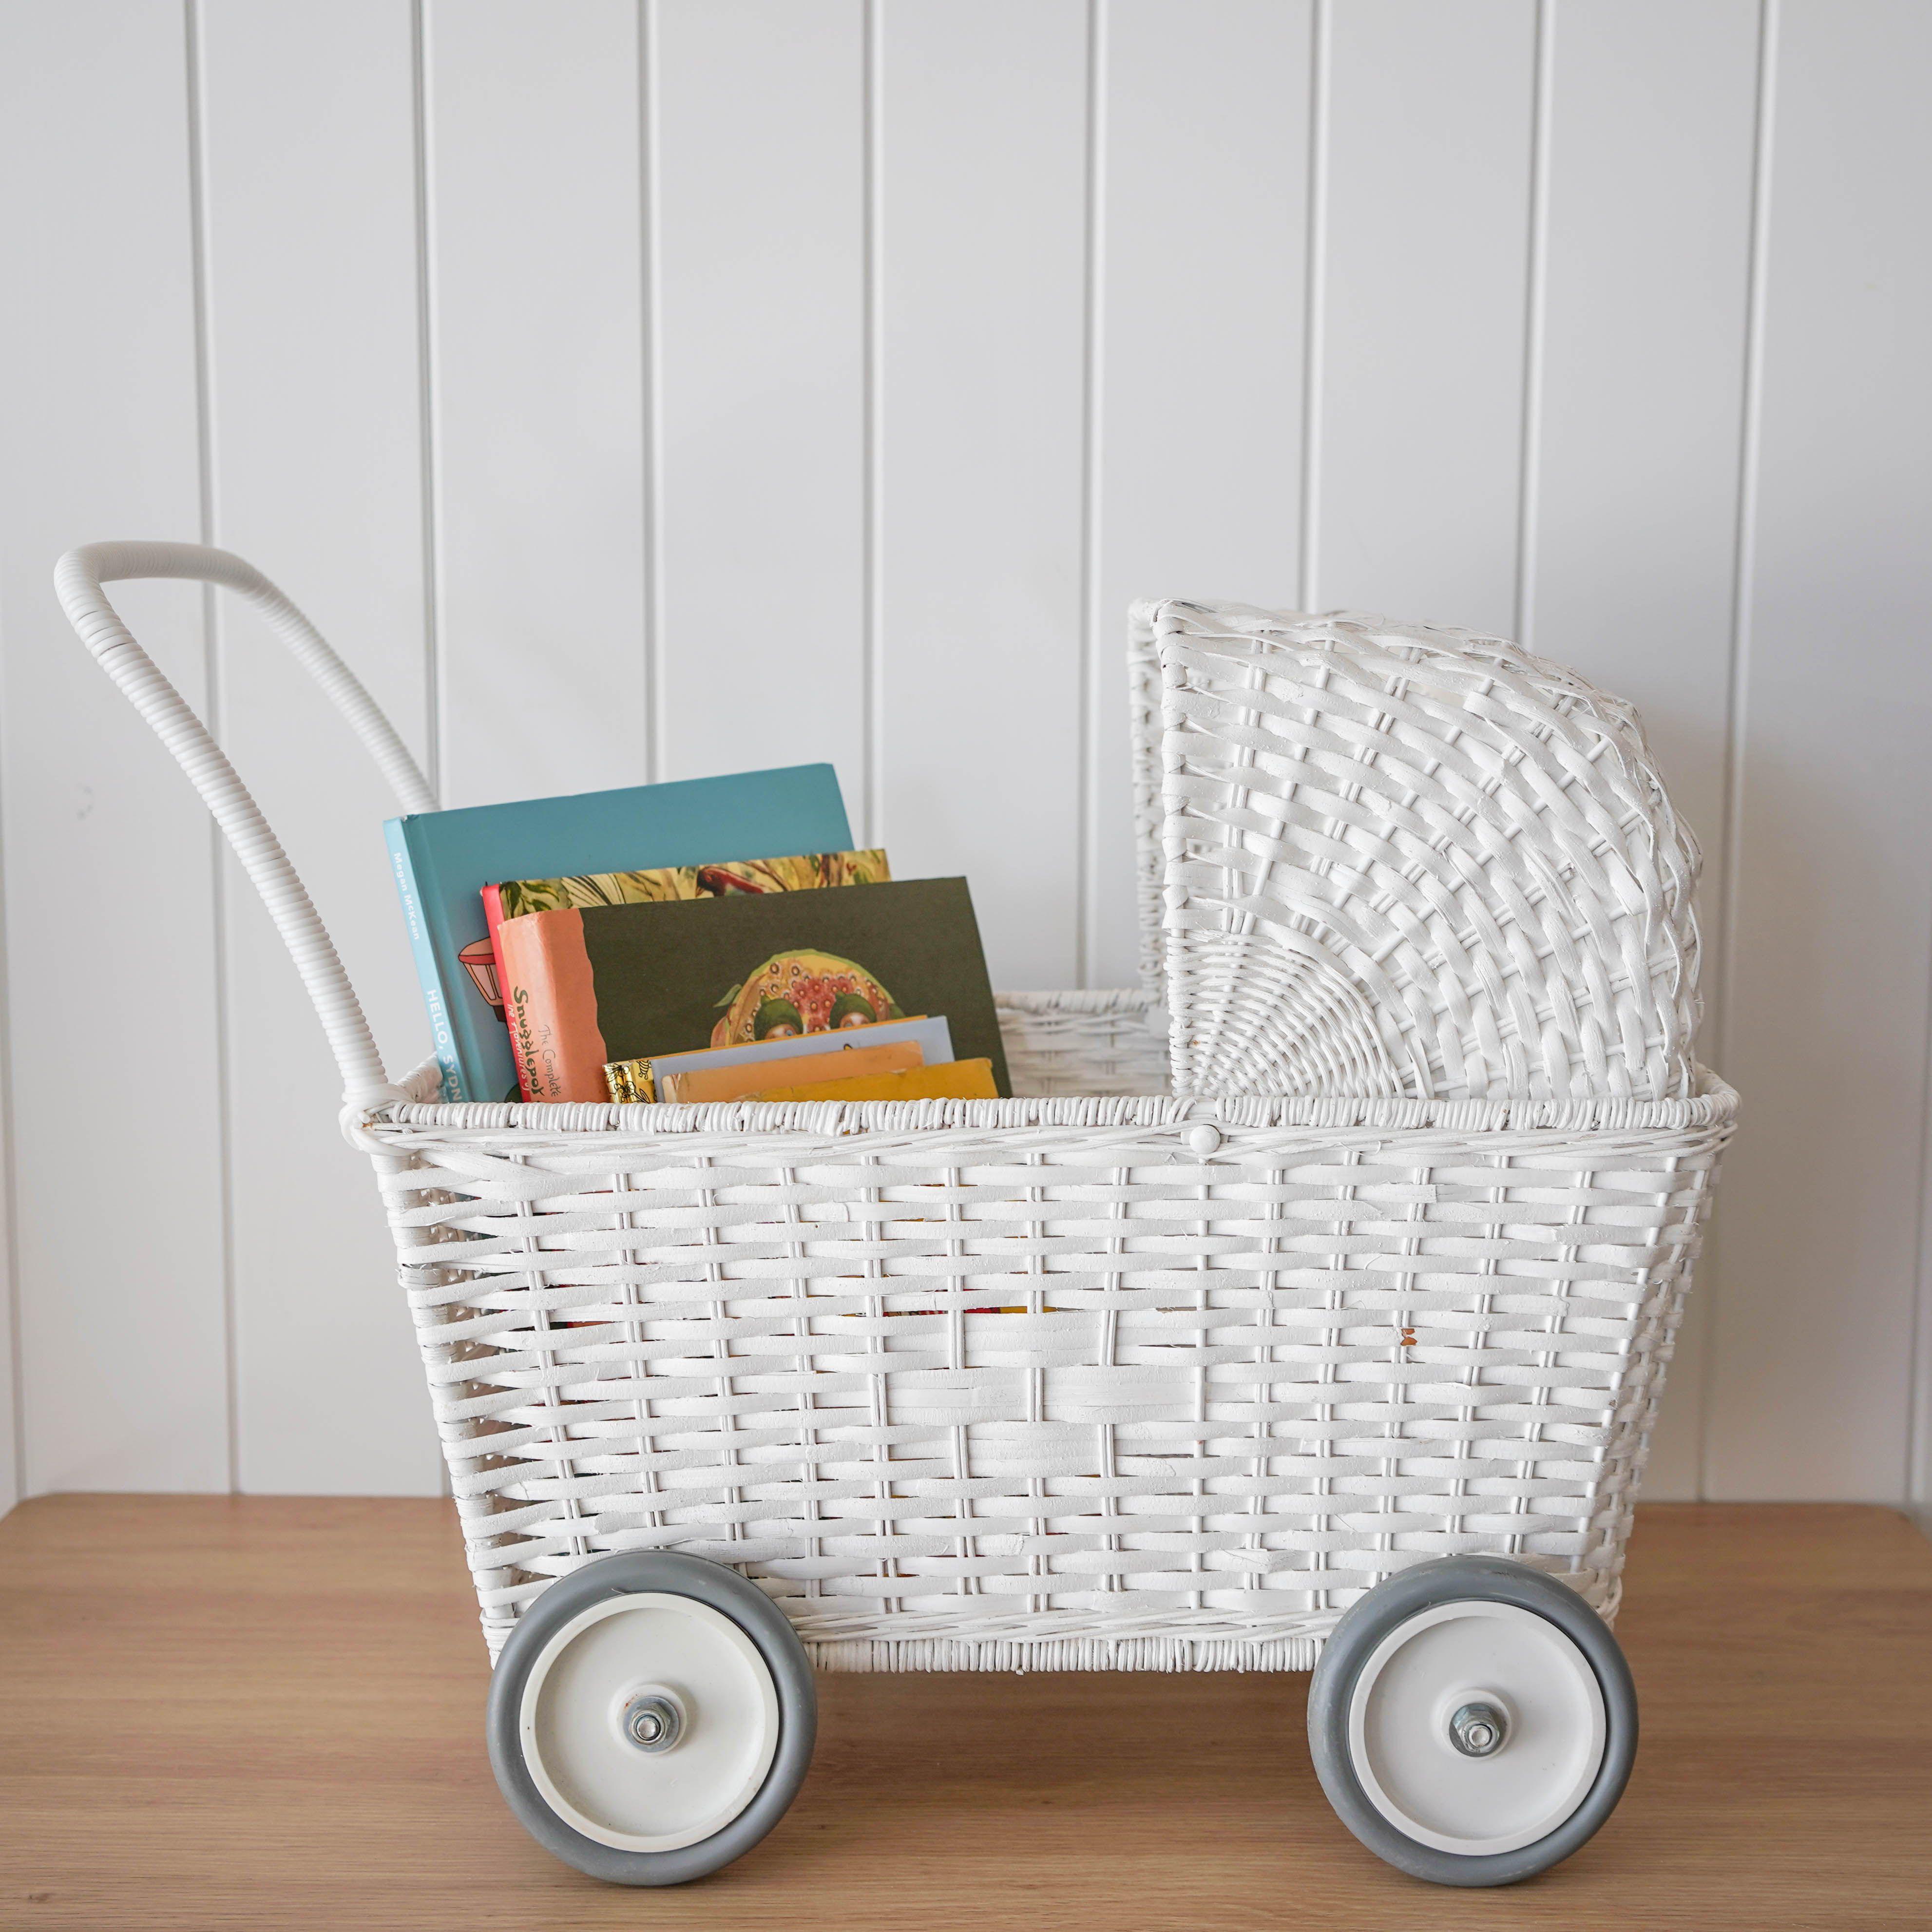 Olli Ella Strolley Convertible Rattan Stroller Trolley Nursery Room Decor Nursery Room Baby Nursery